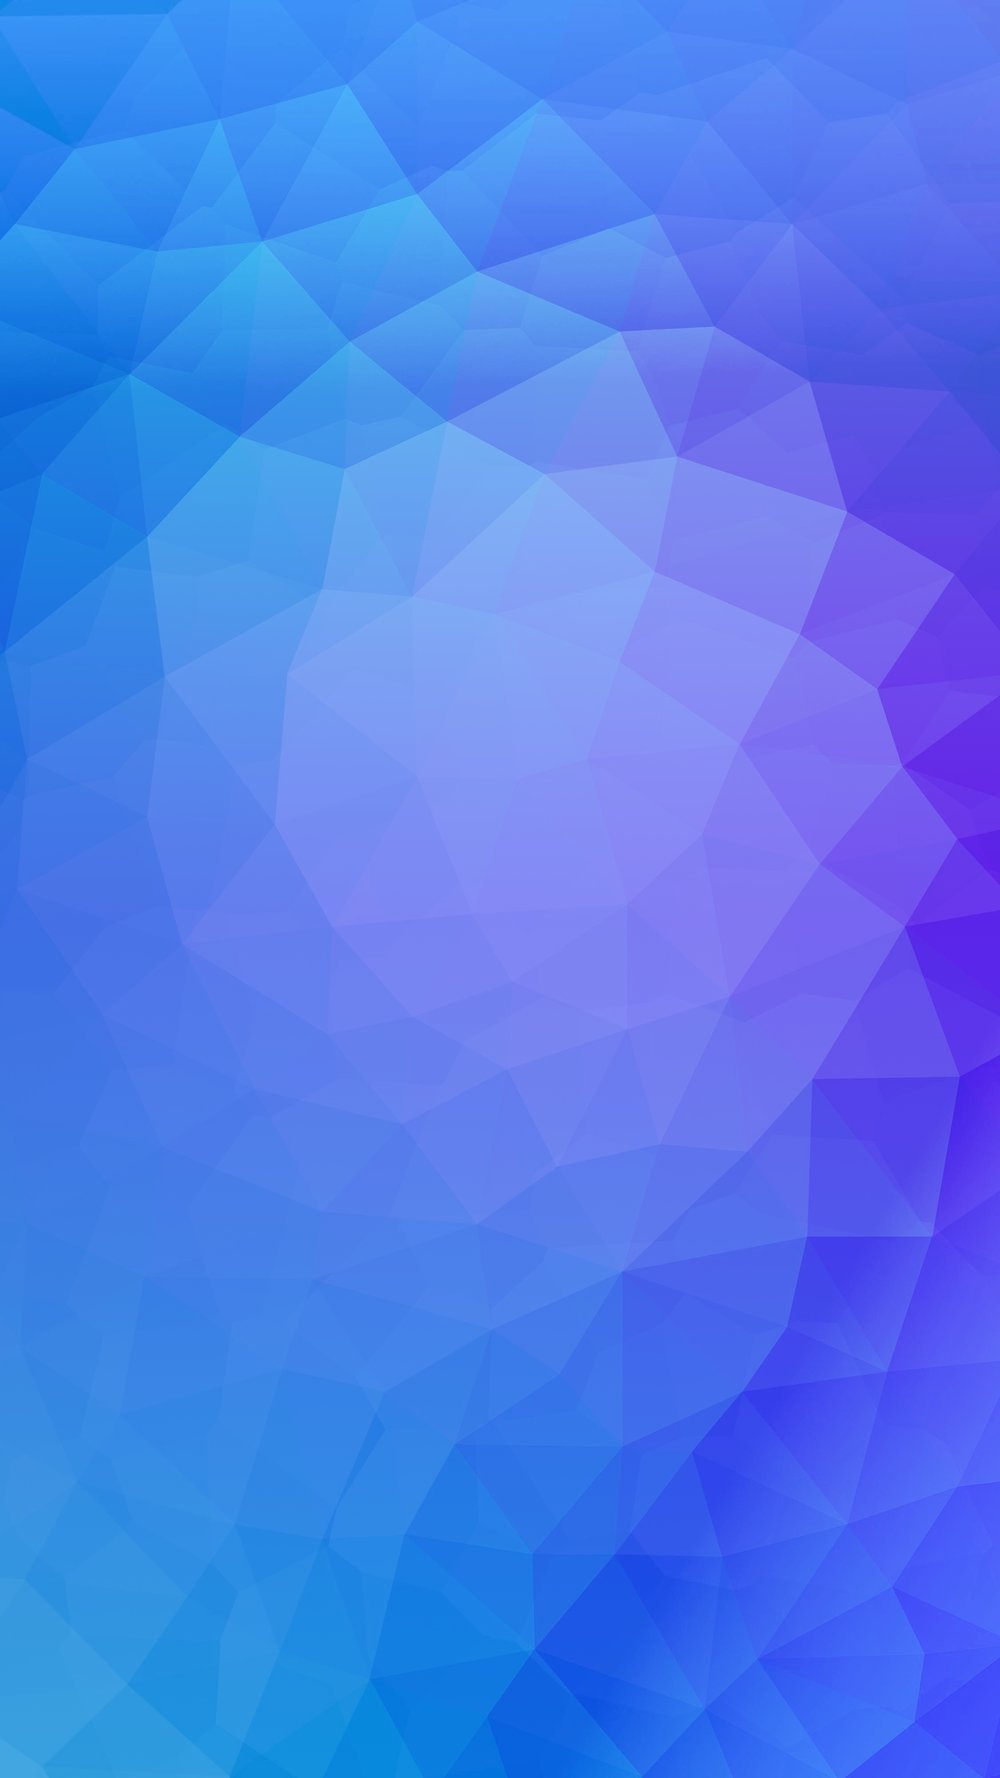 color-salt-crystal.jpg